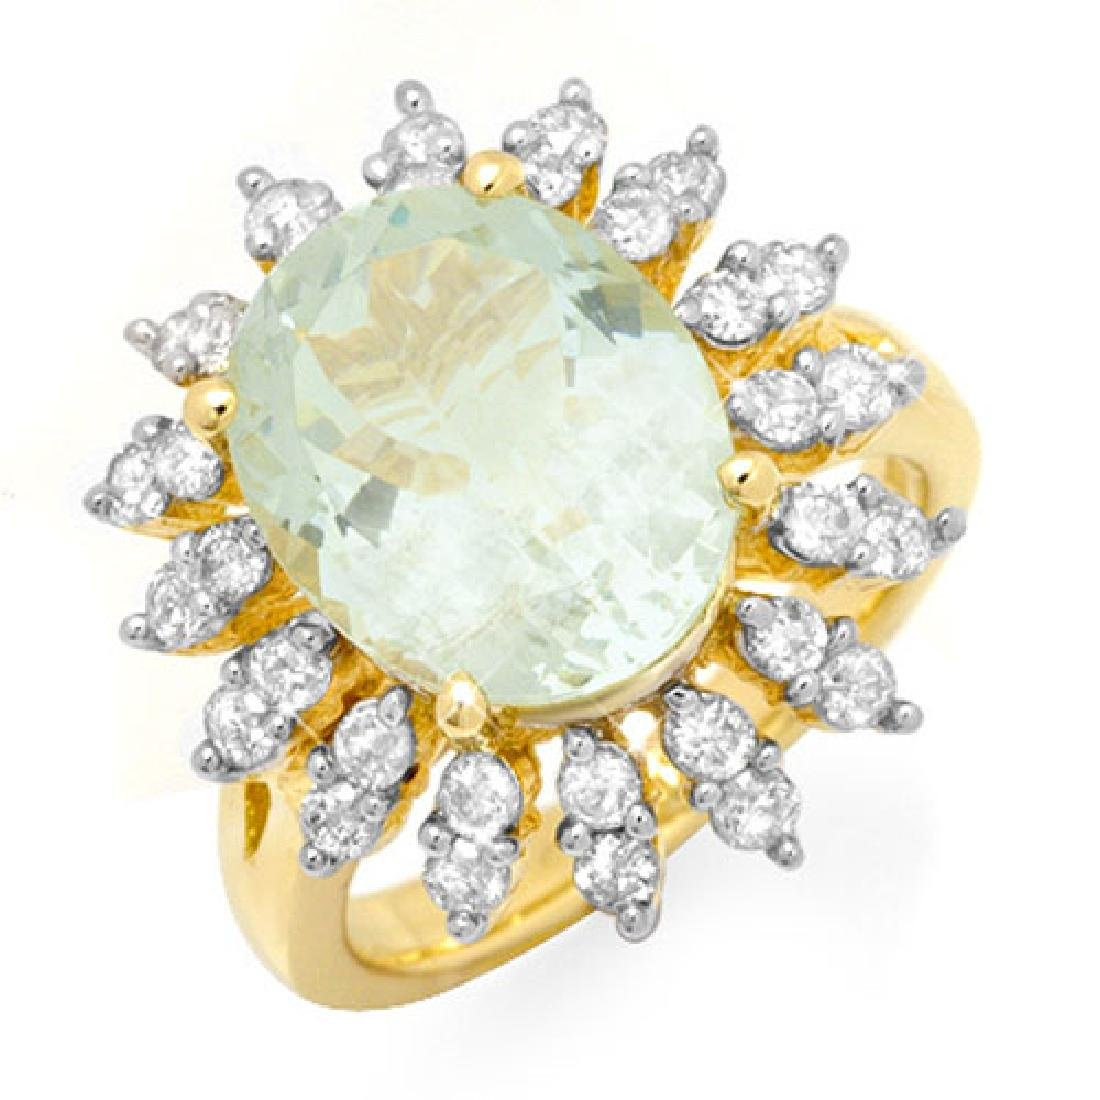 6.08 CTW Aquamarine & Diamond Ring 14K Yellow Gold